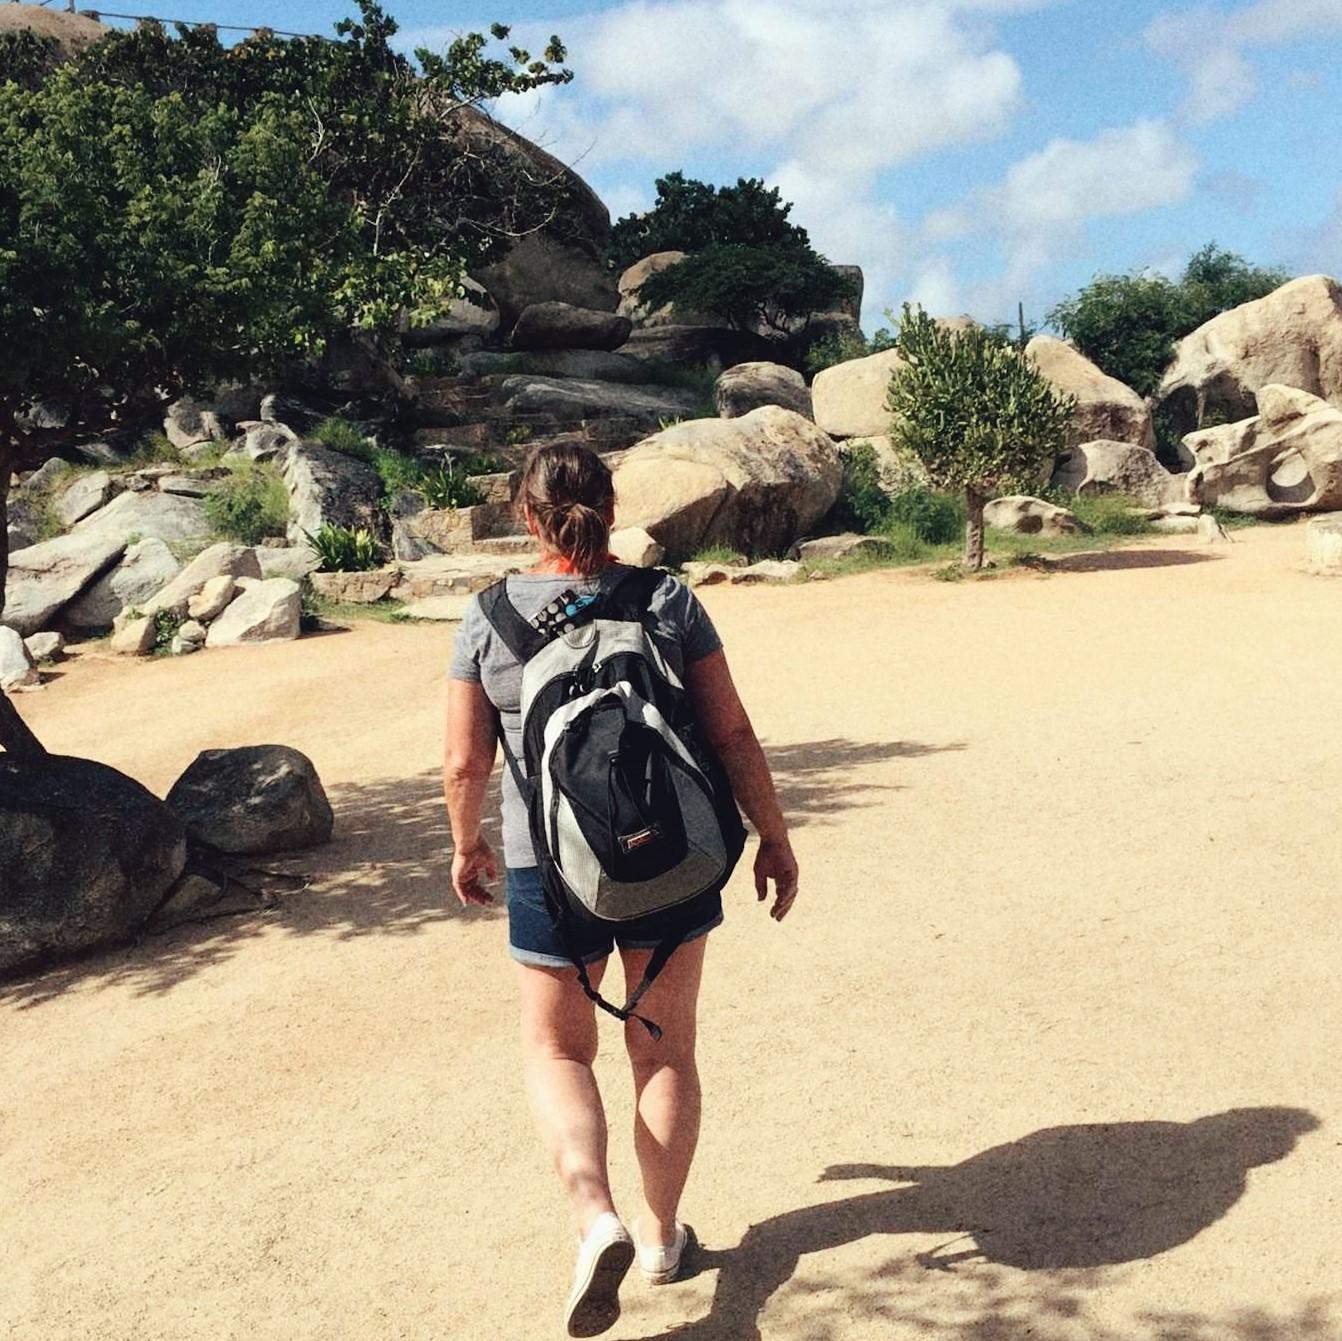 Solo Travel – Bursting That Bubble